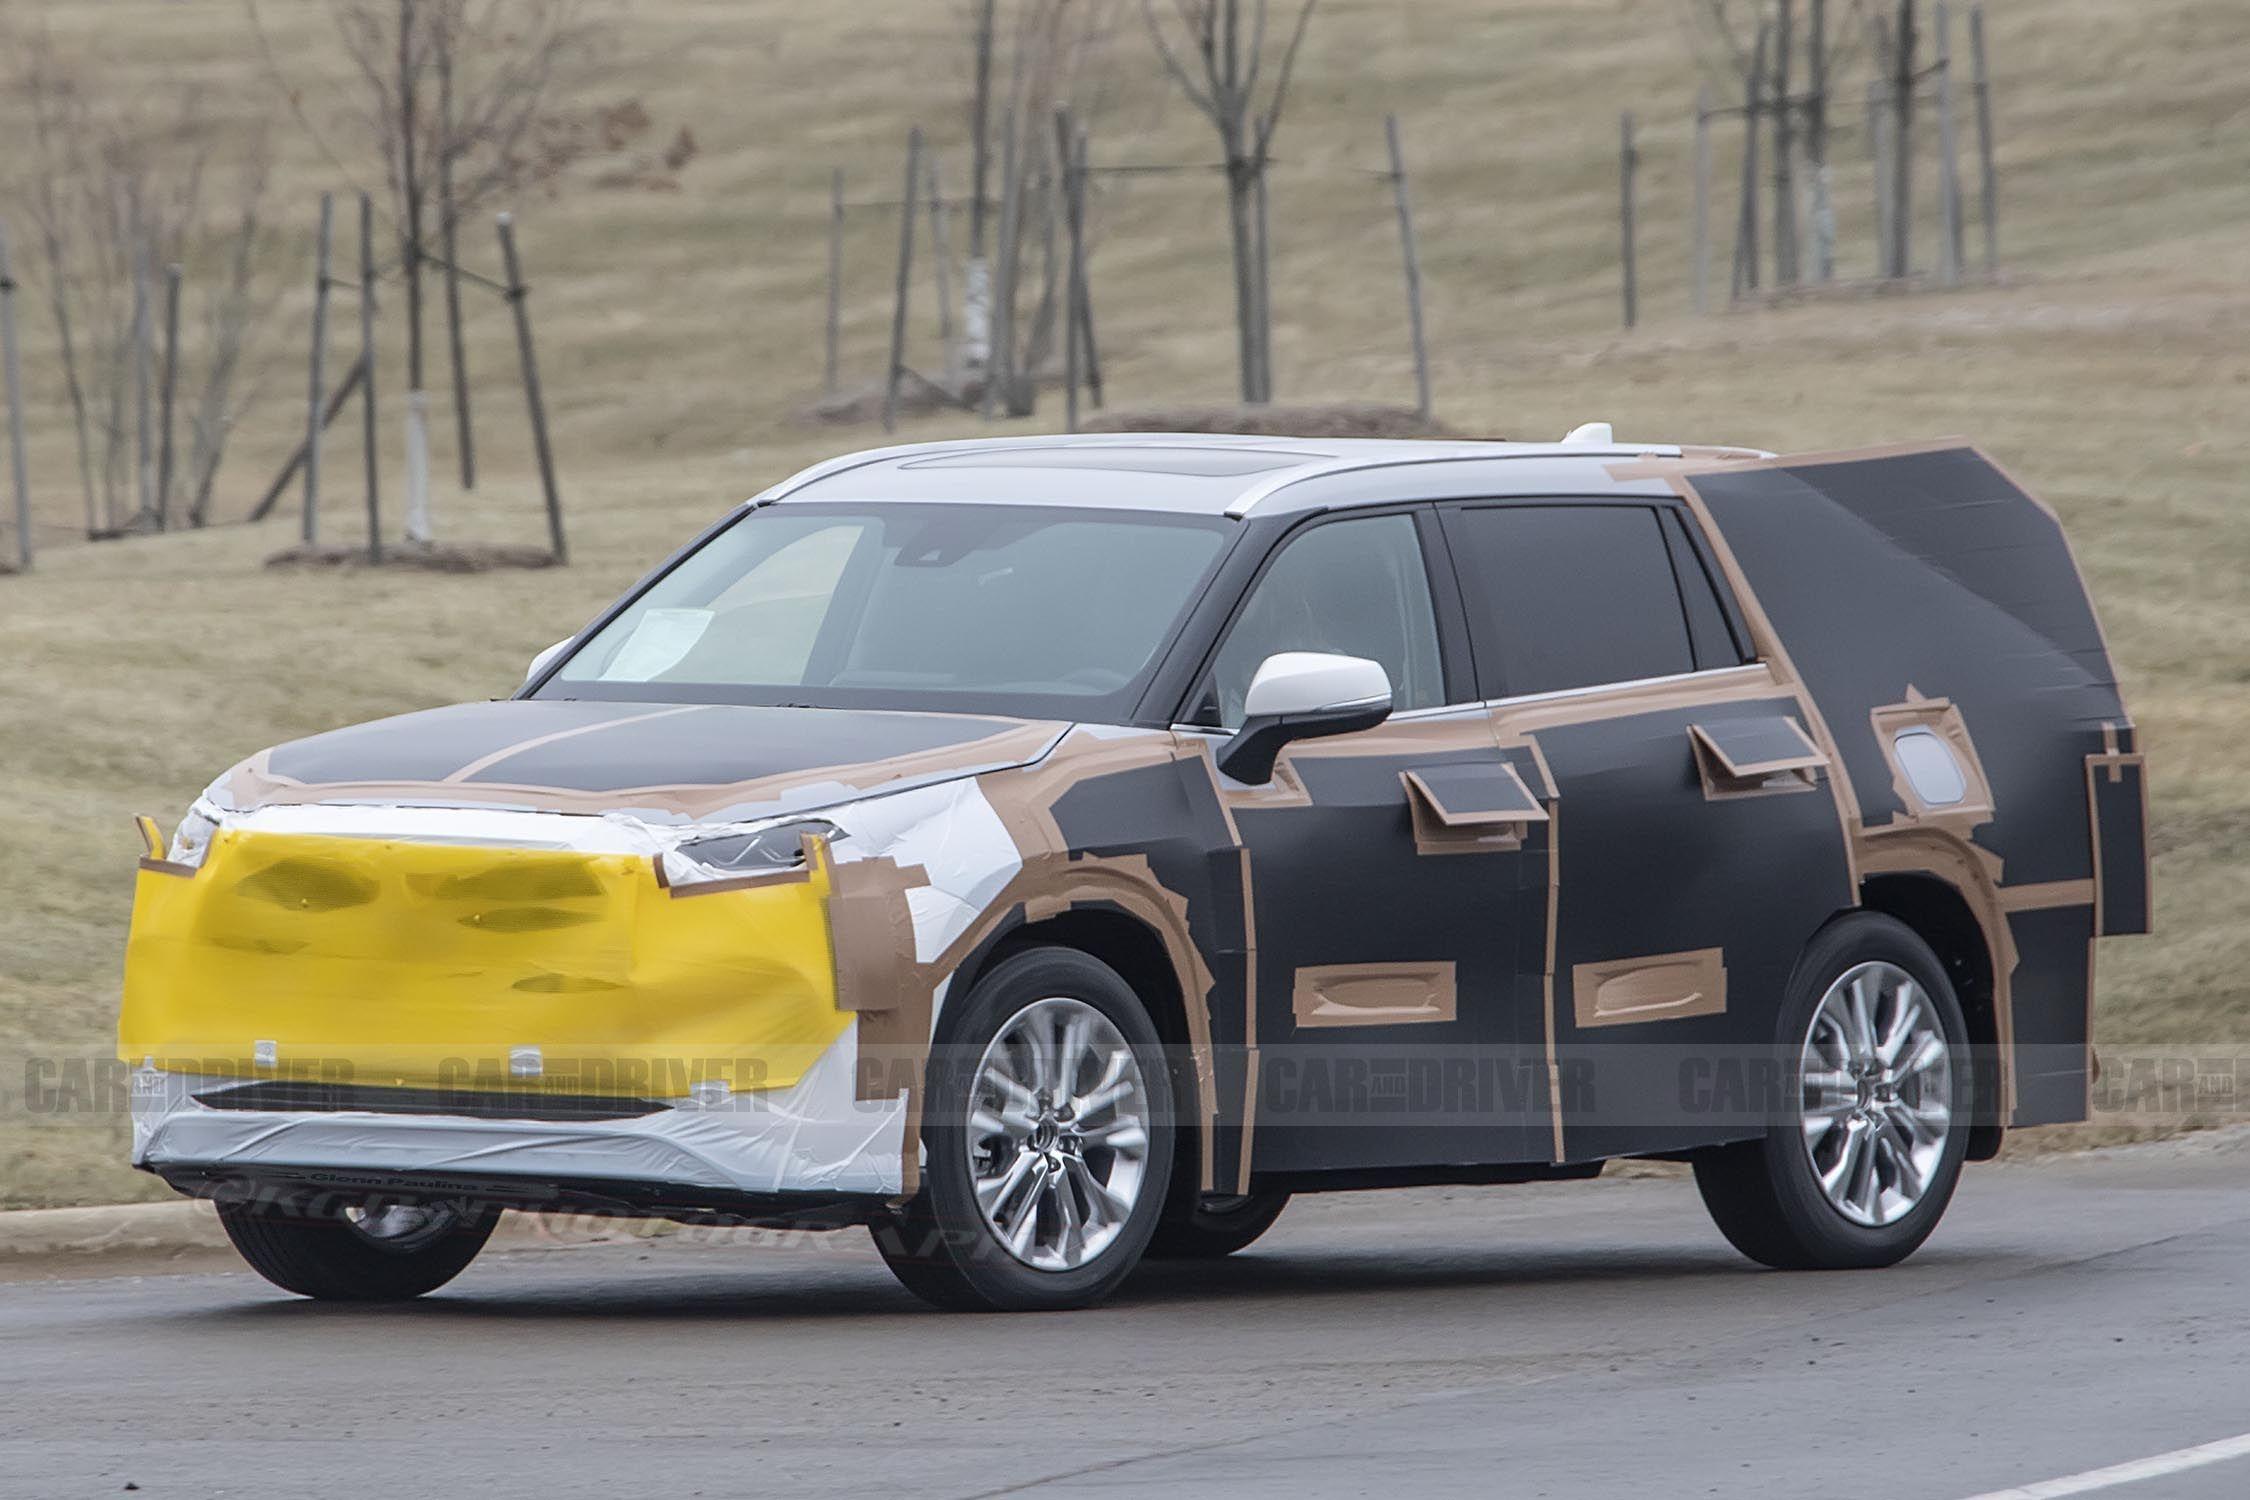 2020 Mclaren SUV Rumors, Redesign, Release Date >> 2020 Toyota Highlander Three Row Suv Spied Redesigned Crossover